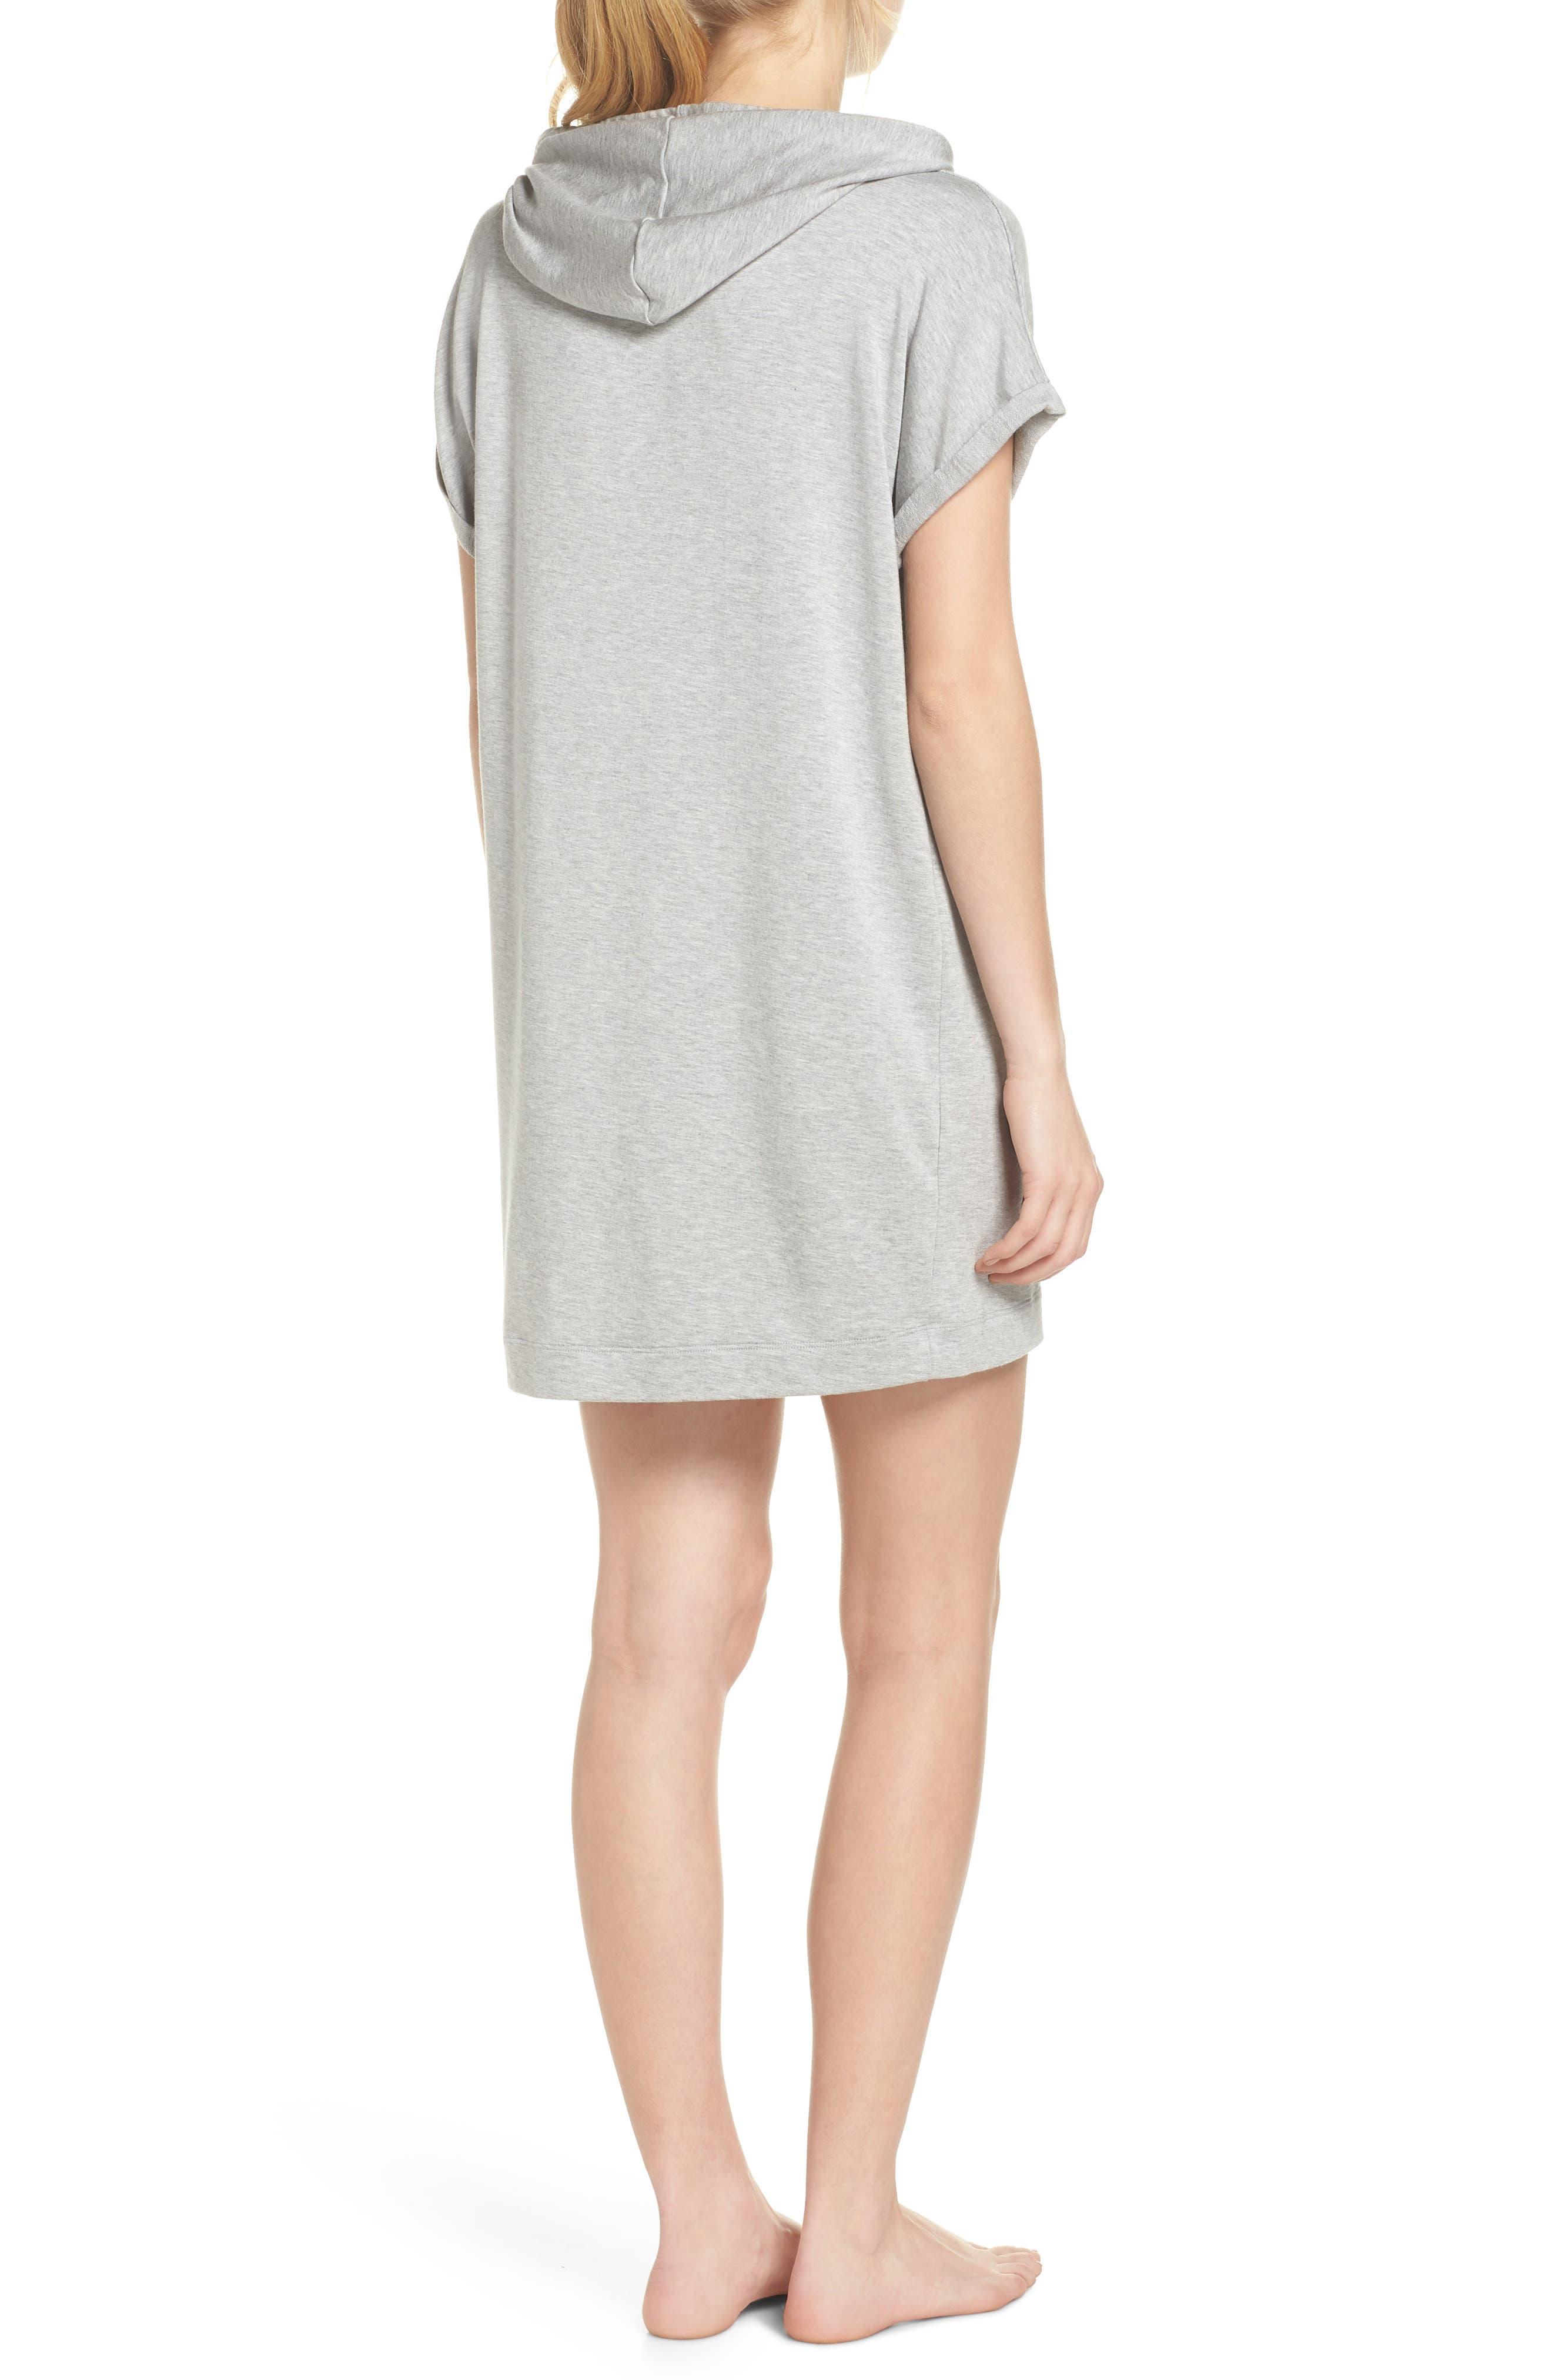 It's All Hoodie Hooded Sweatshirt Dress,                             Alternate thumbnail 2, color,                             LIGHT HEATHER GRAY